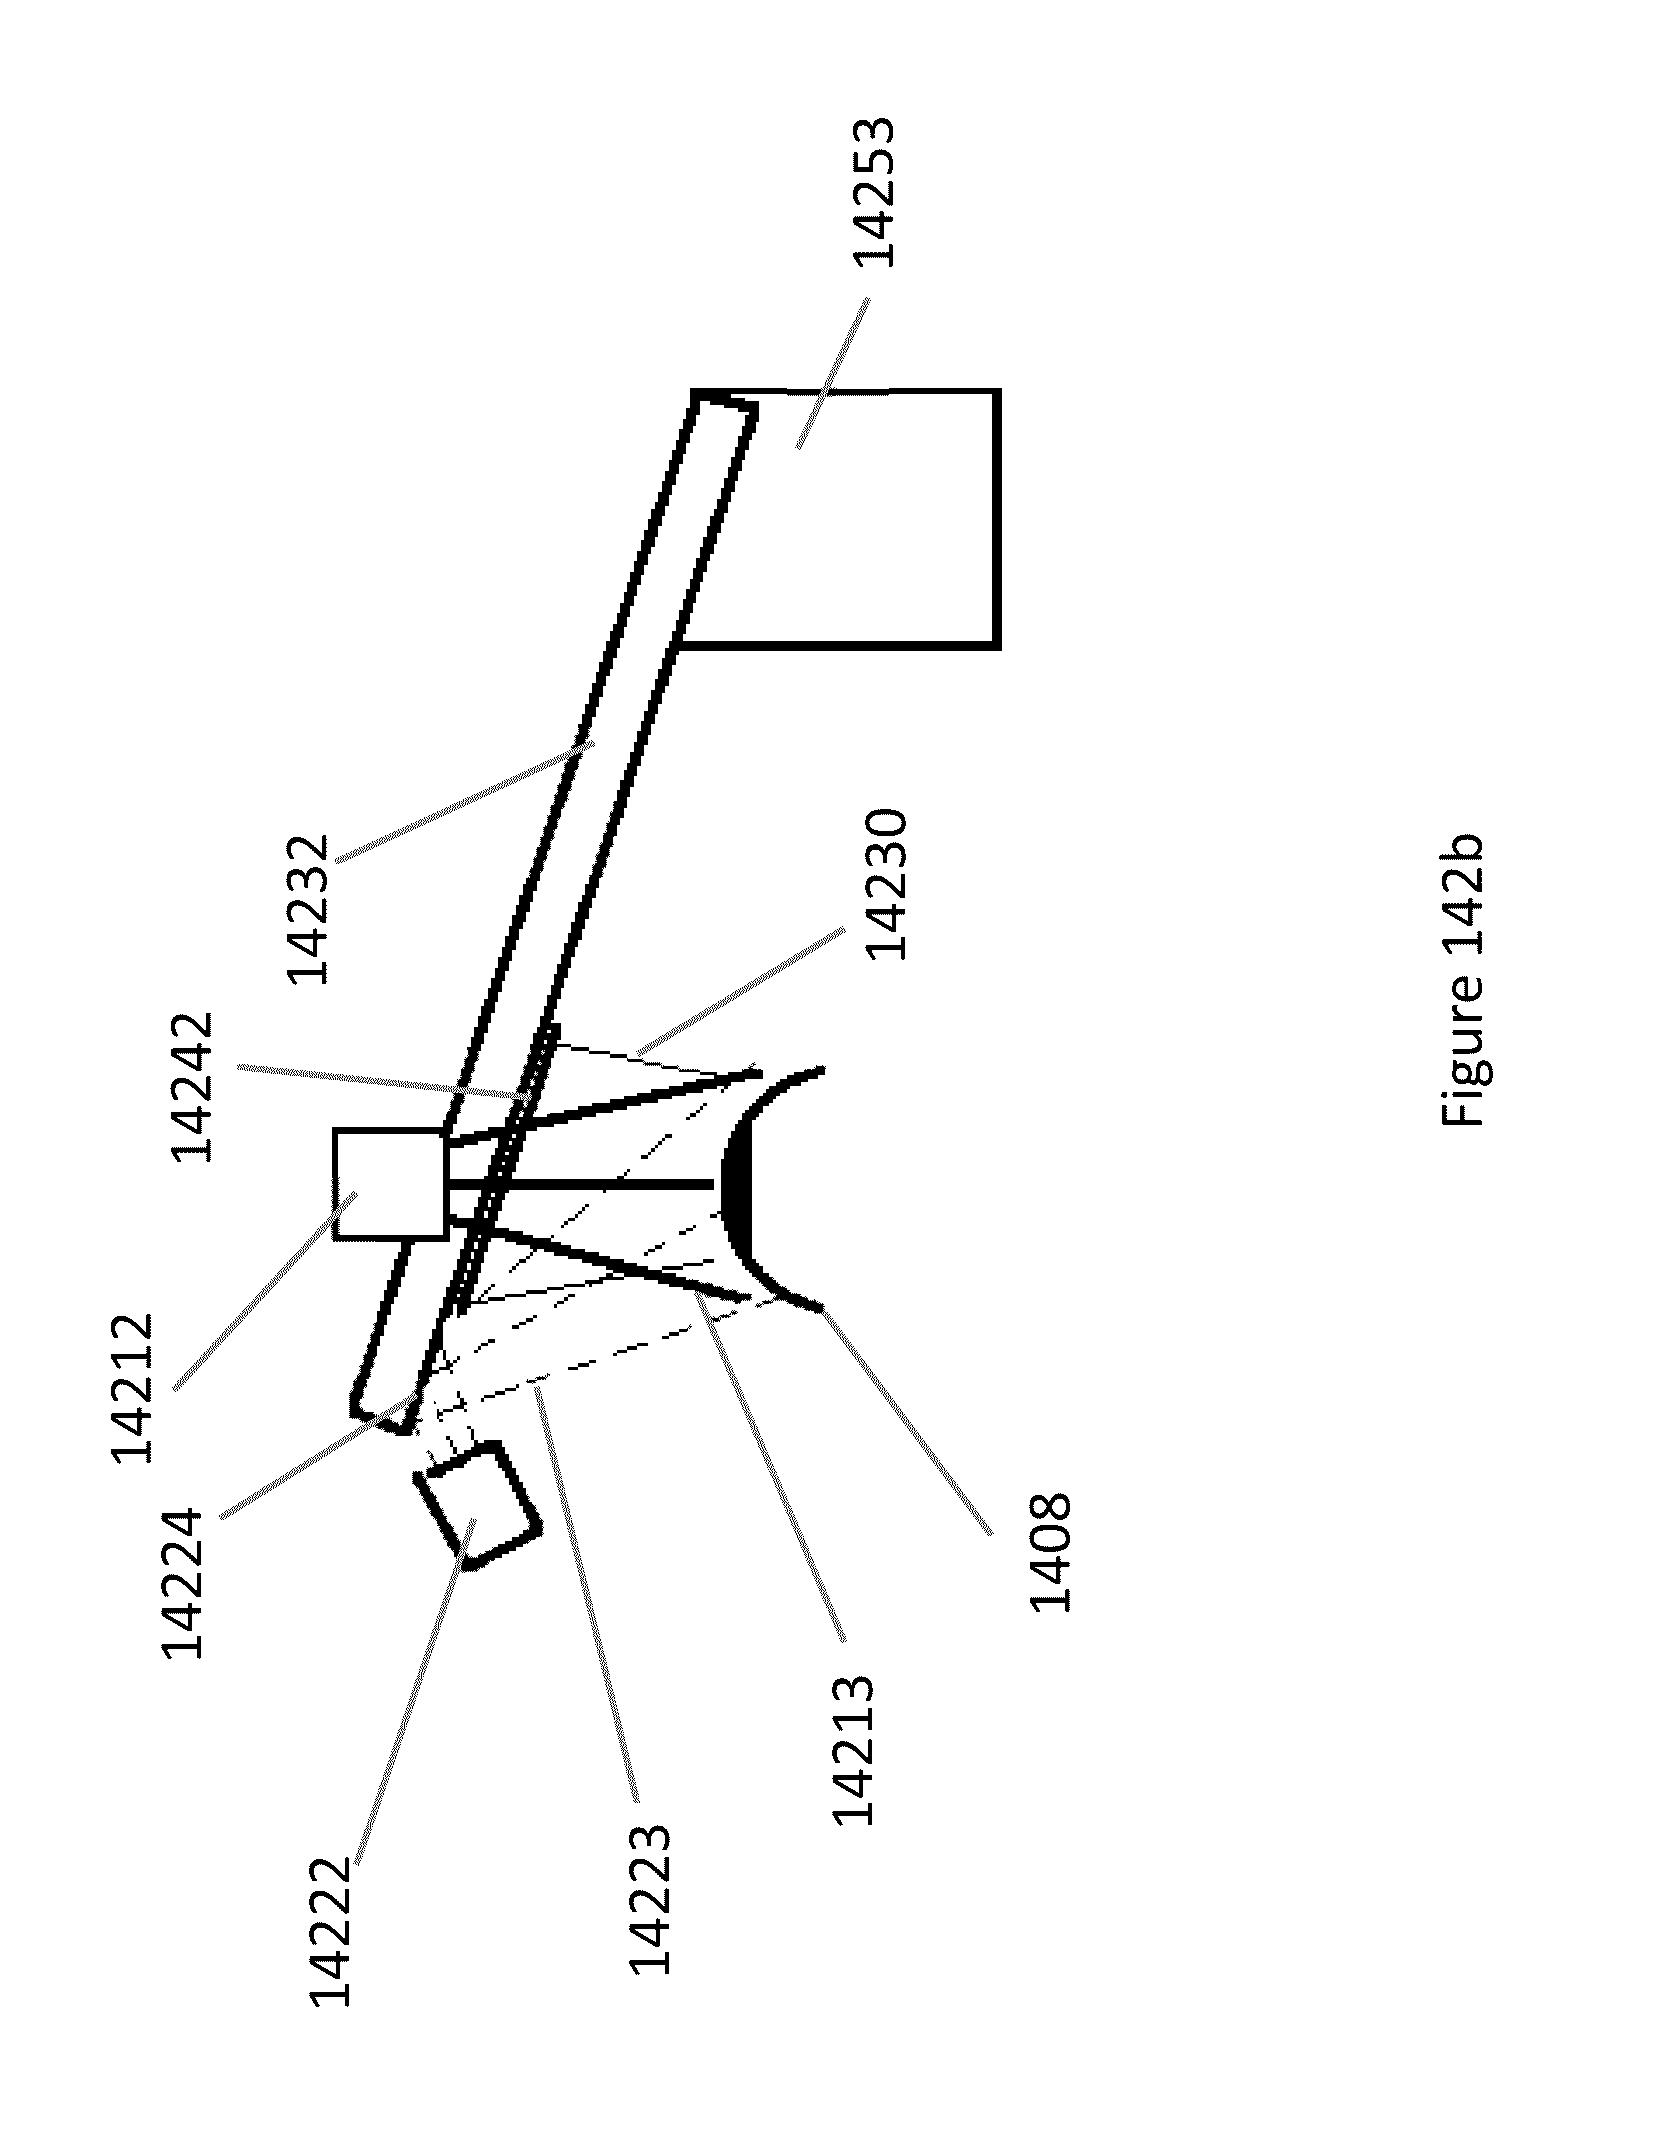 patent us 9 658 457 b2 Spark Plug Firing Order patent images